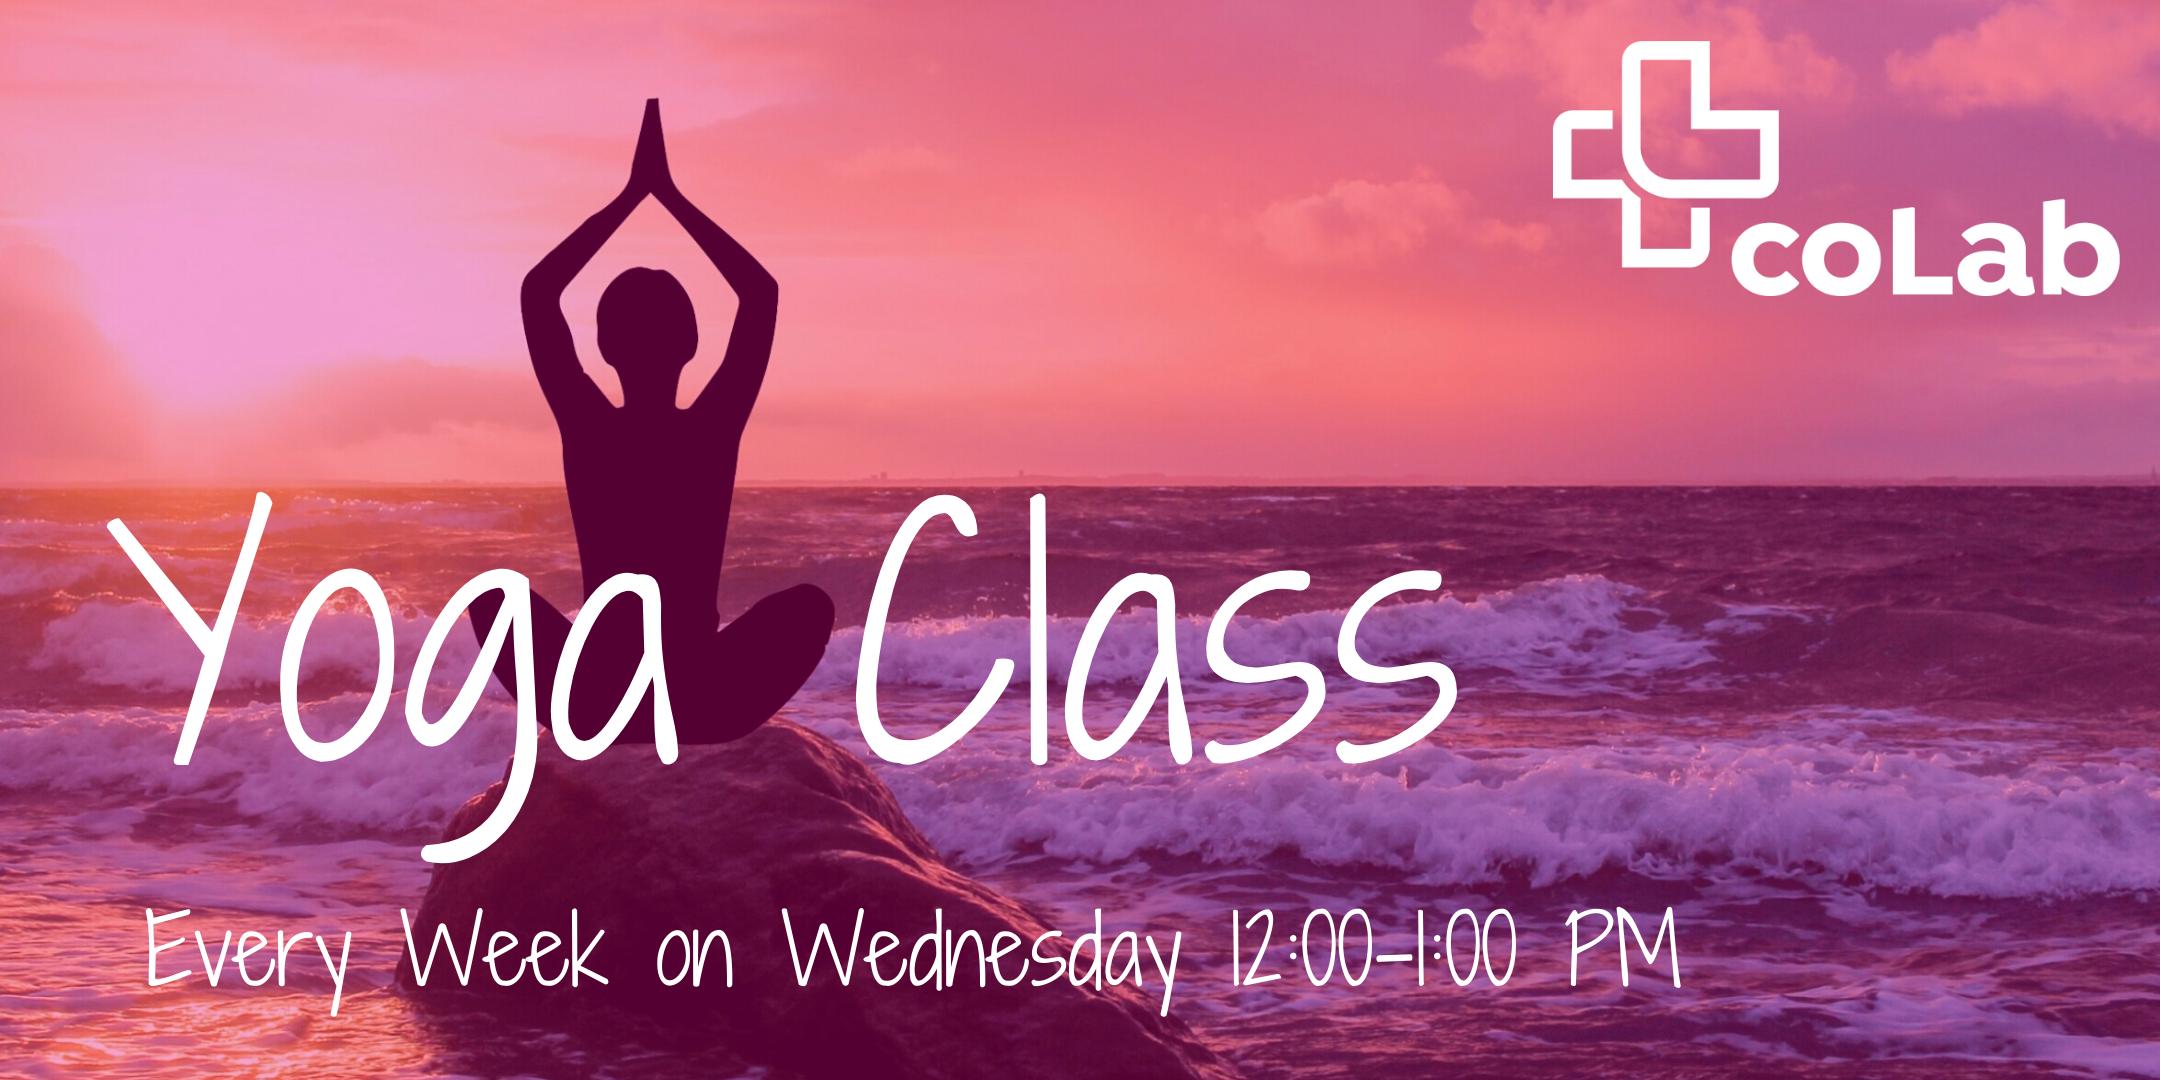 coLab Yoga Class